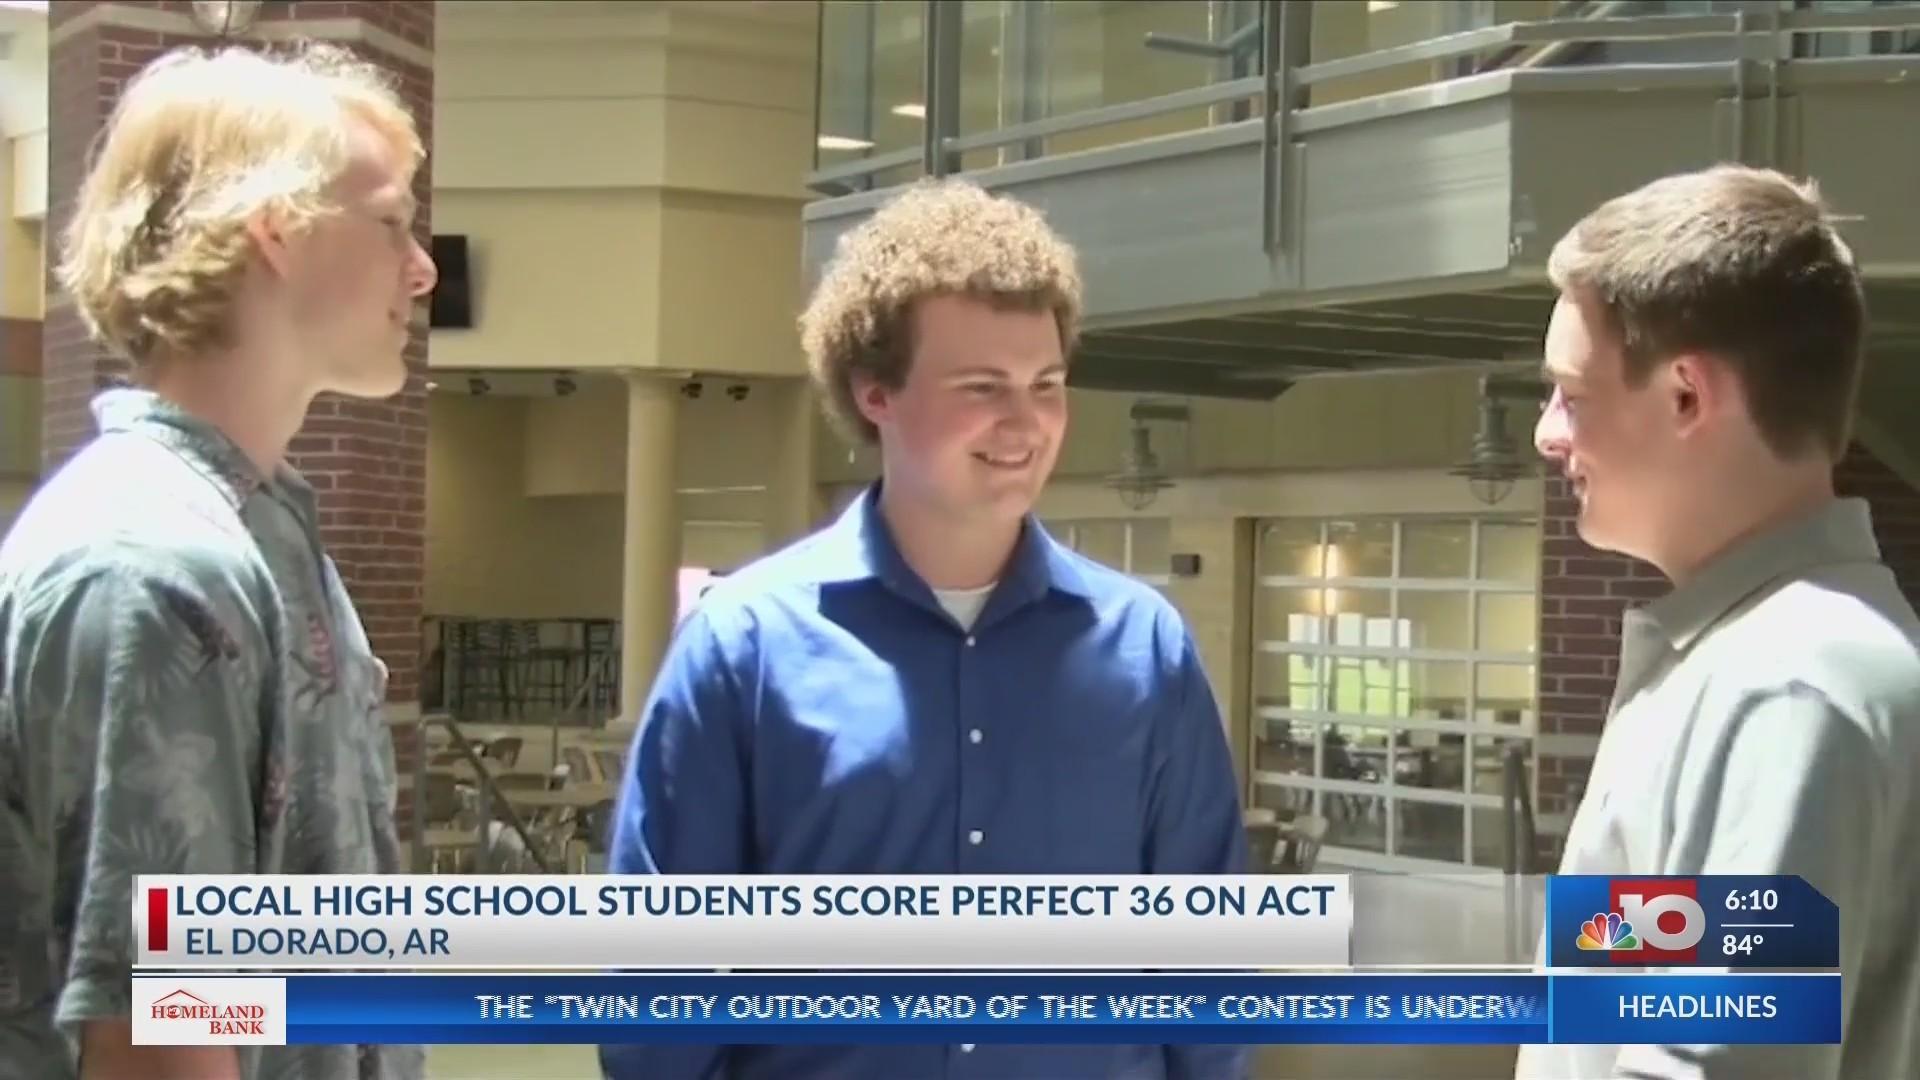 El Dorado High School students receive perfect score on the ACT